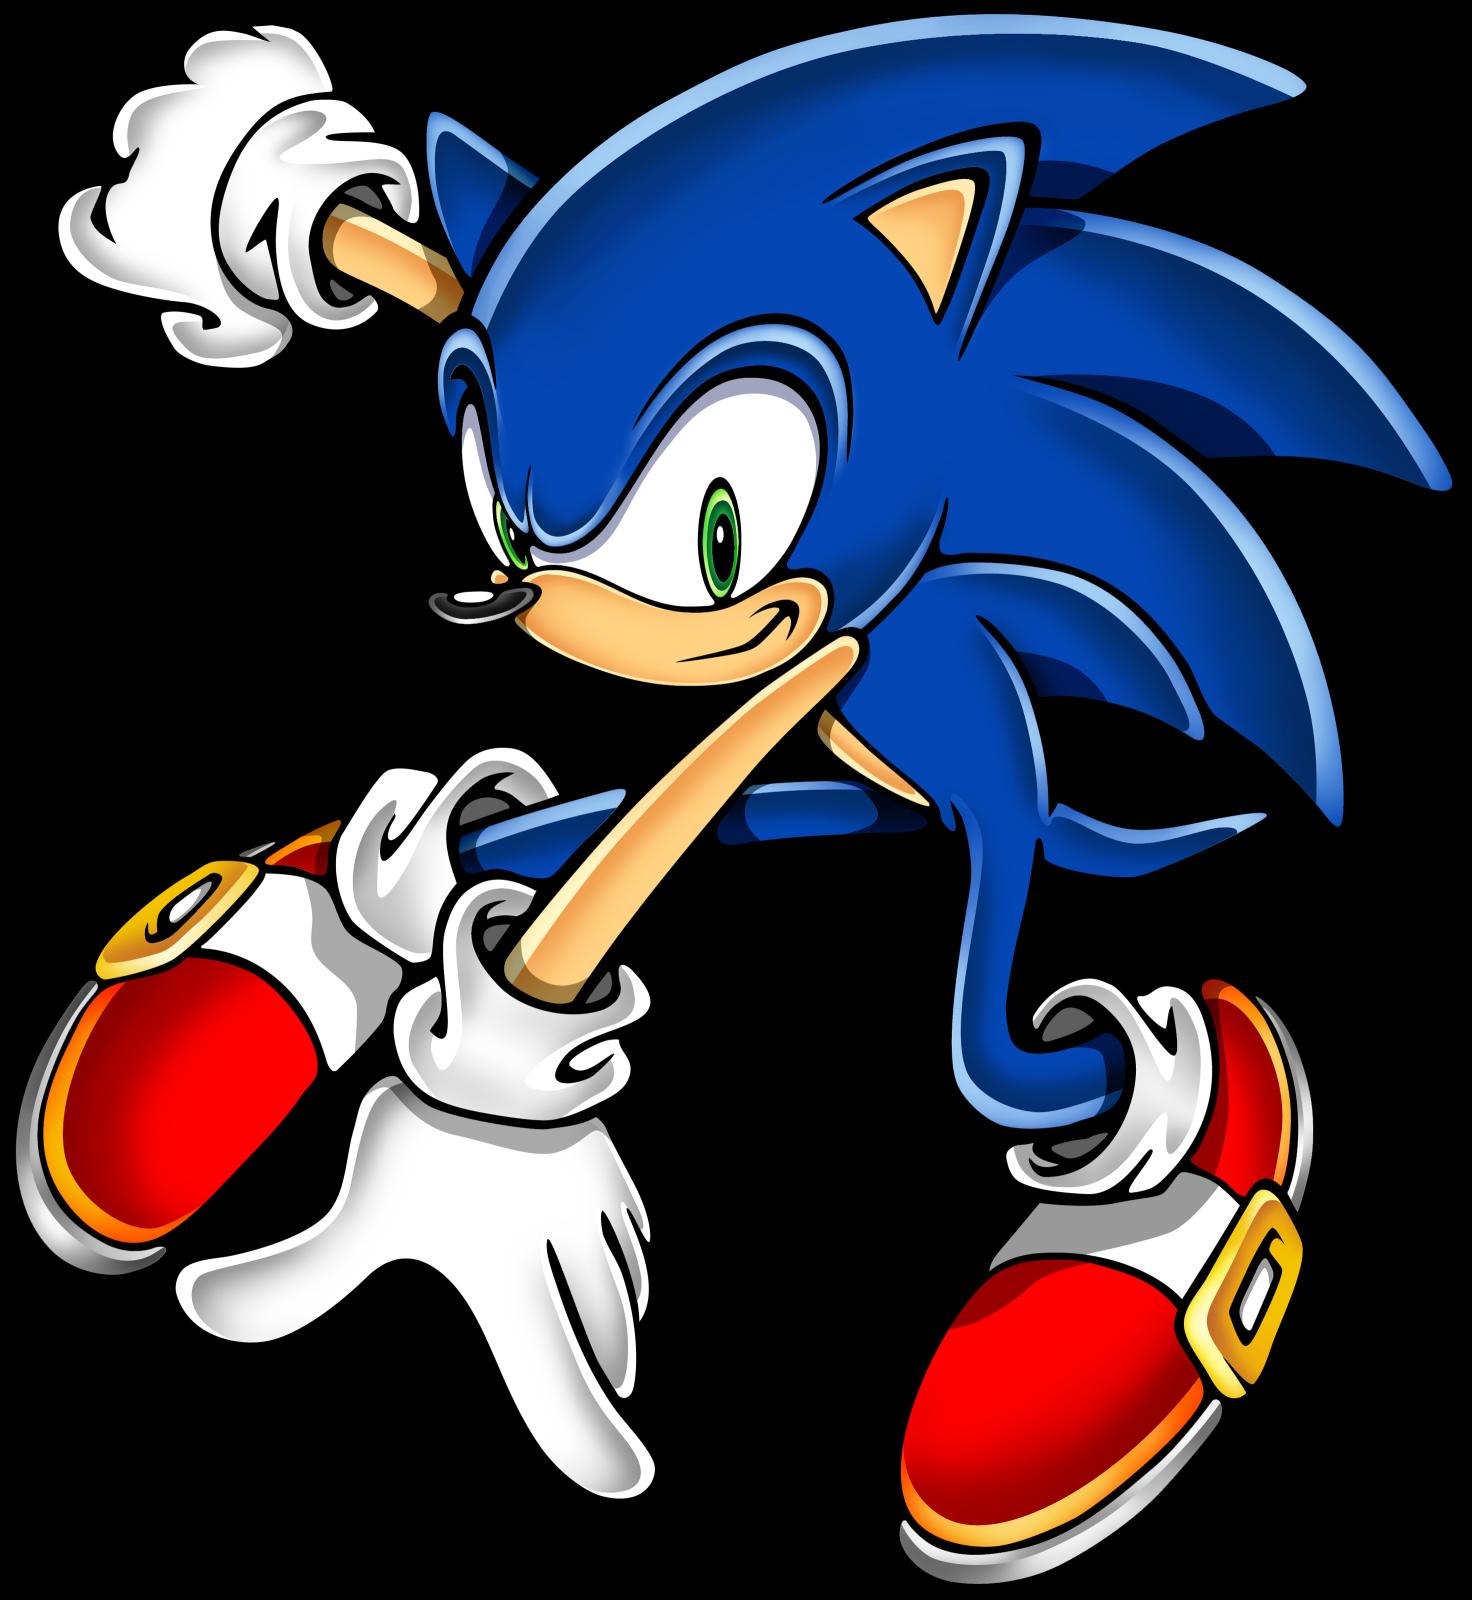 Hedgehog clipart colorful. Image sonic art assets